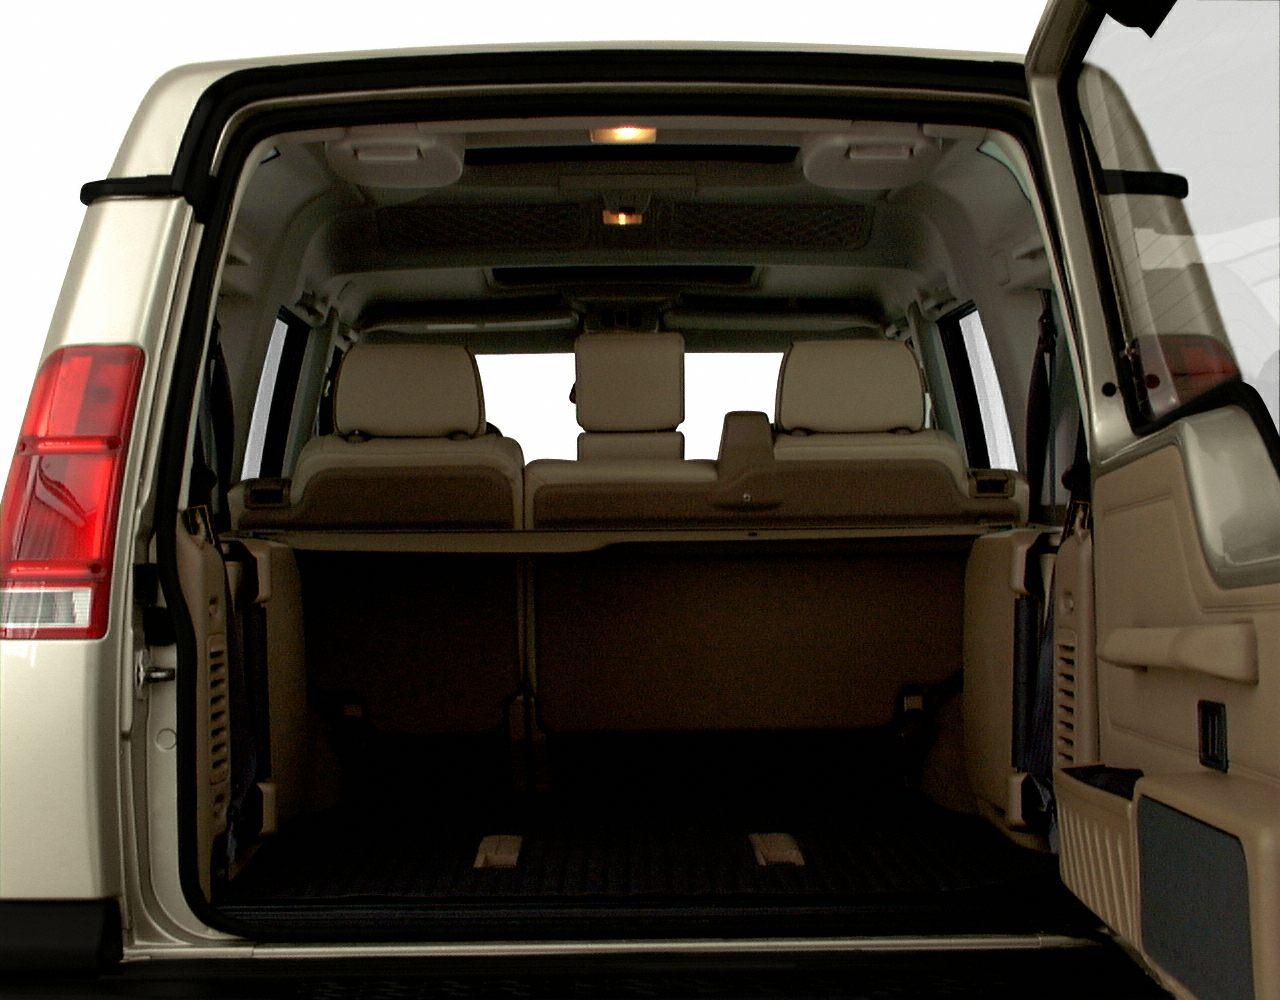 2000 Land Rover Discovery Exterior Photo